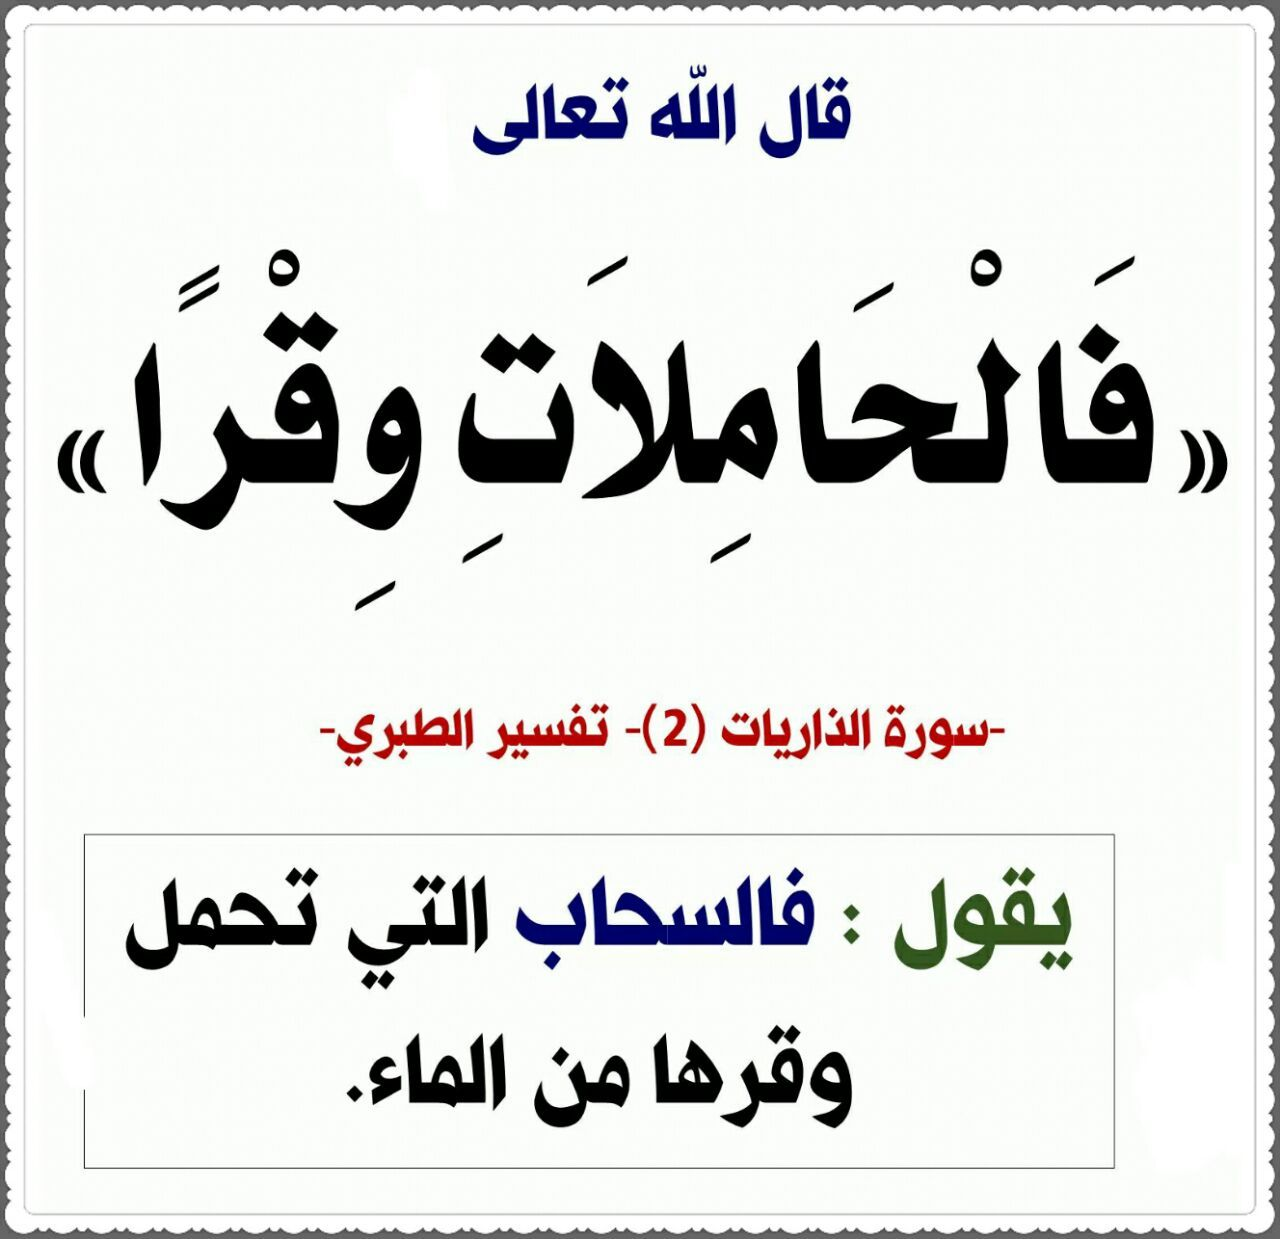 Pin By Yousra Zeidan On آية وتفسير Islamic Quotes Islamic Teachings Quran Tafseer